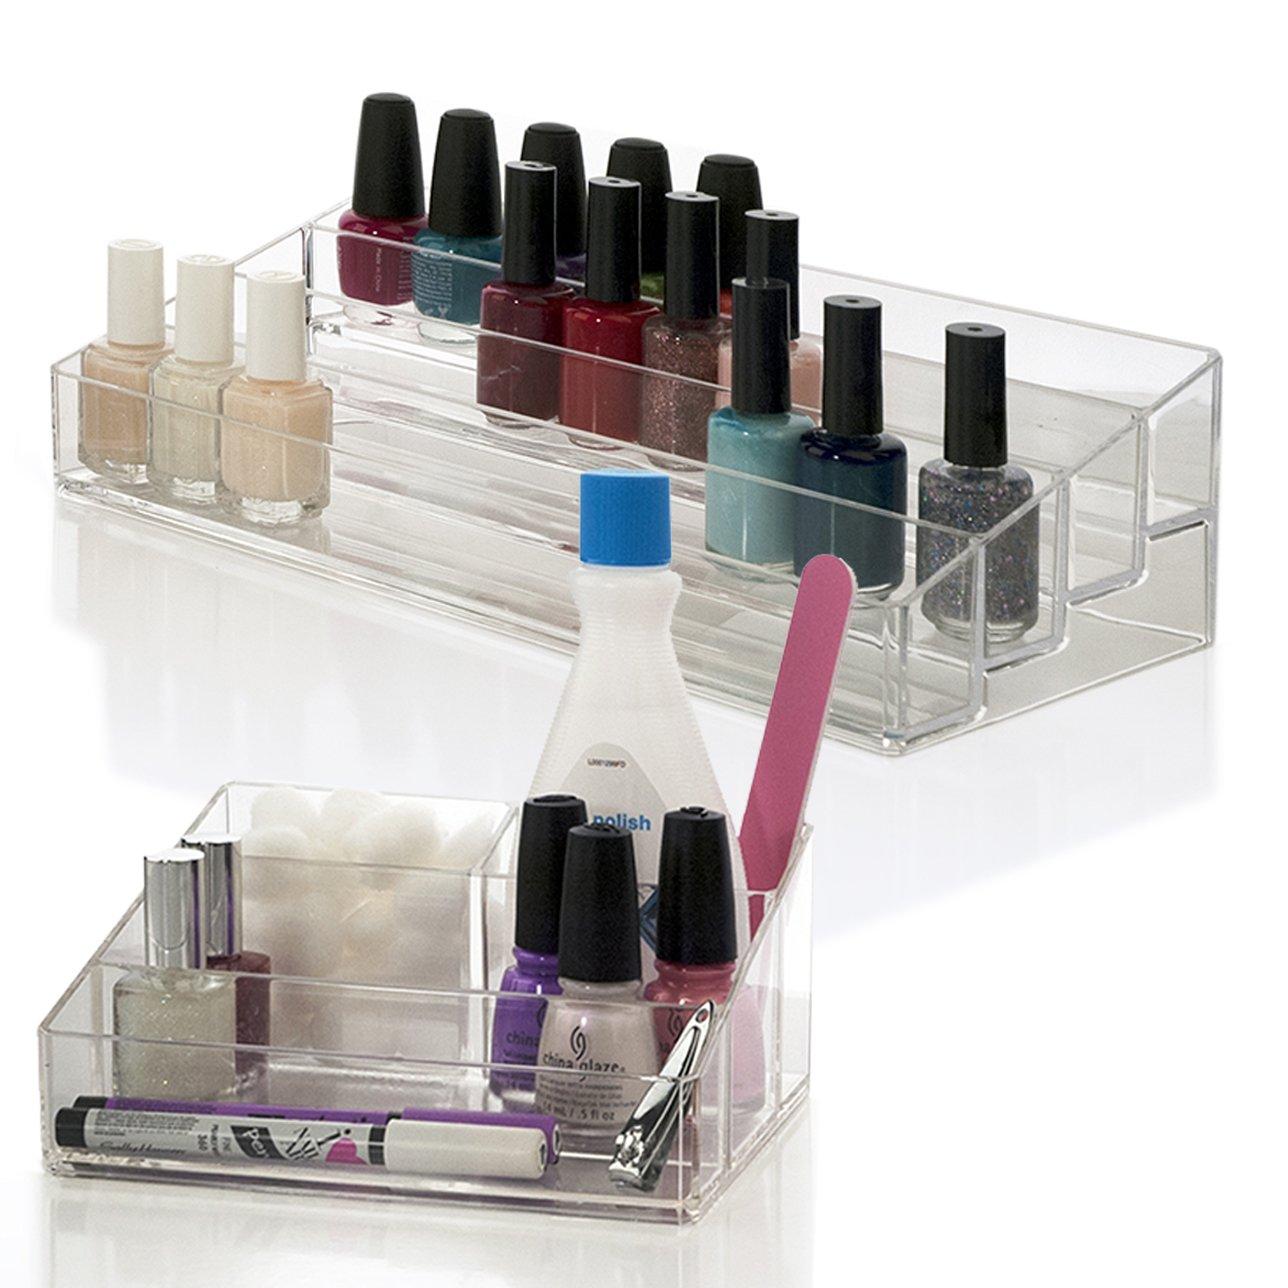 Amazon.com: Nail Polish & Accessory Organizer 2 Piece Set: Beauty